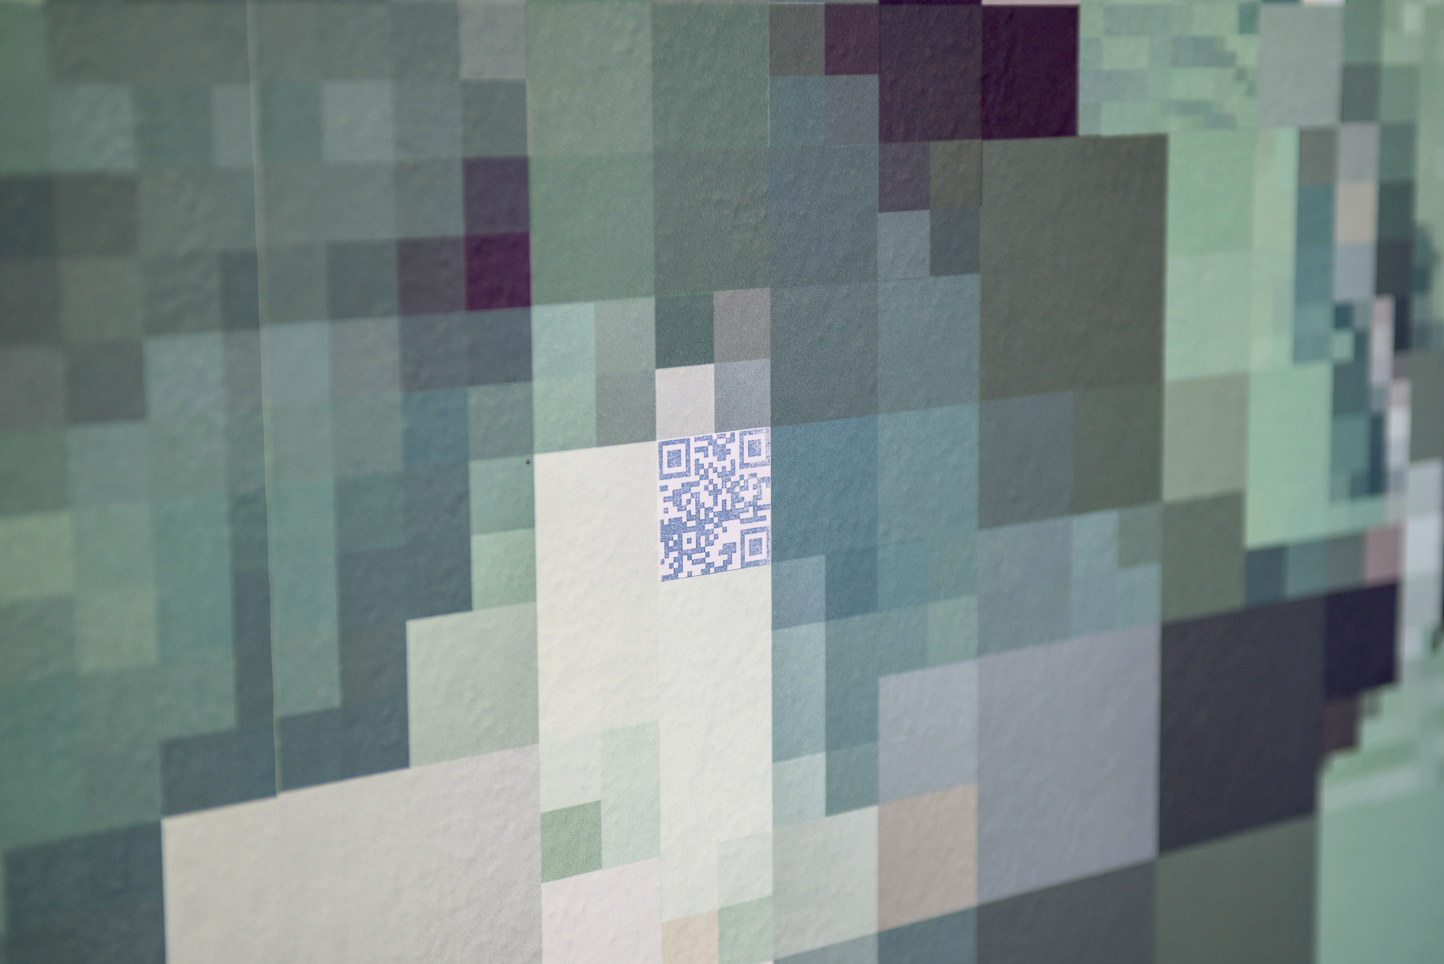 04_Redecode_detail_installation_at_MoCADA.jpg